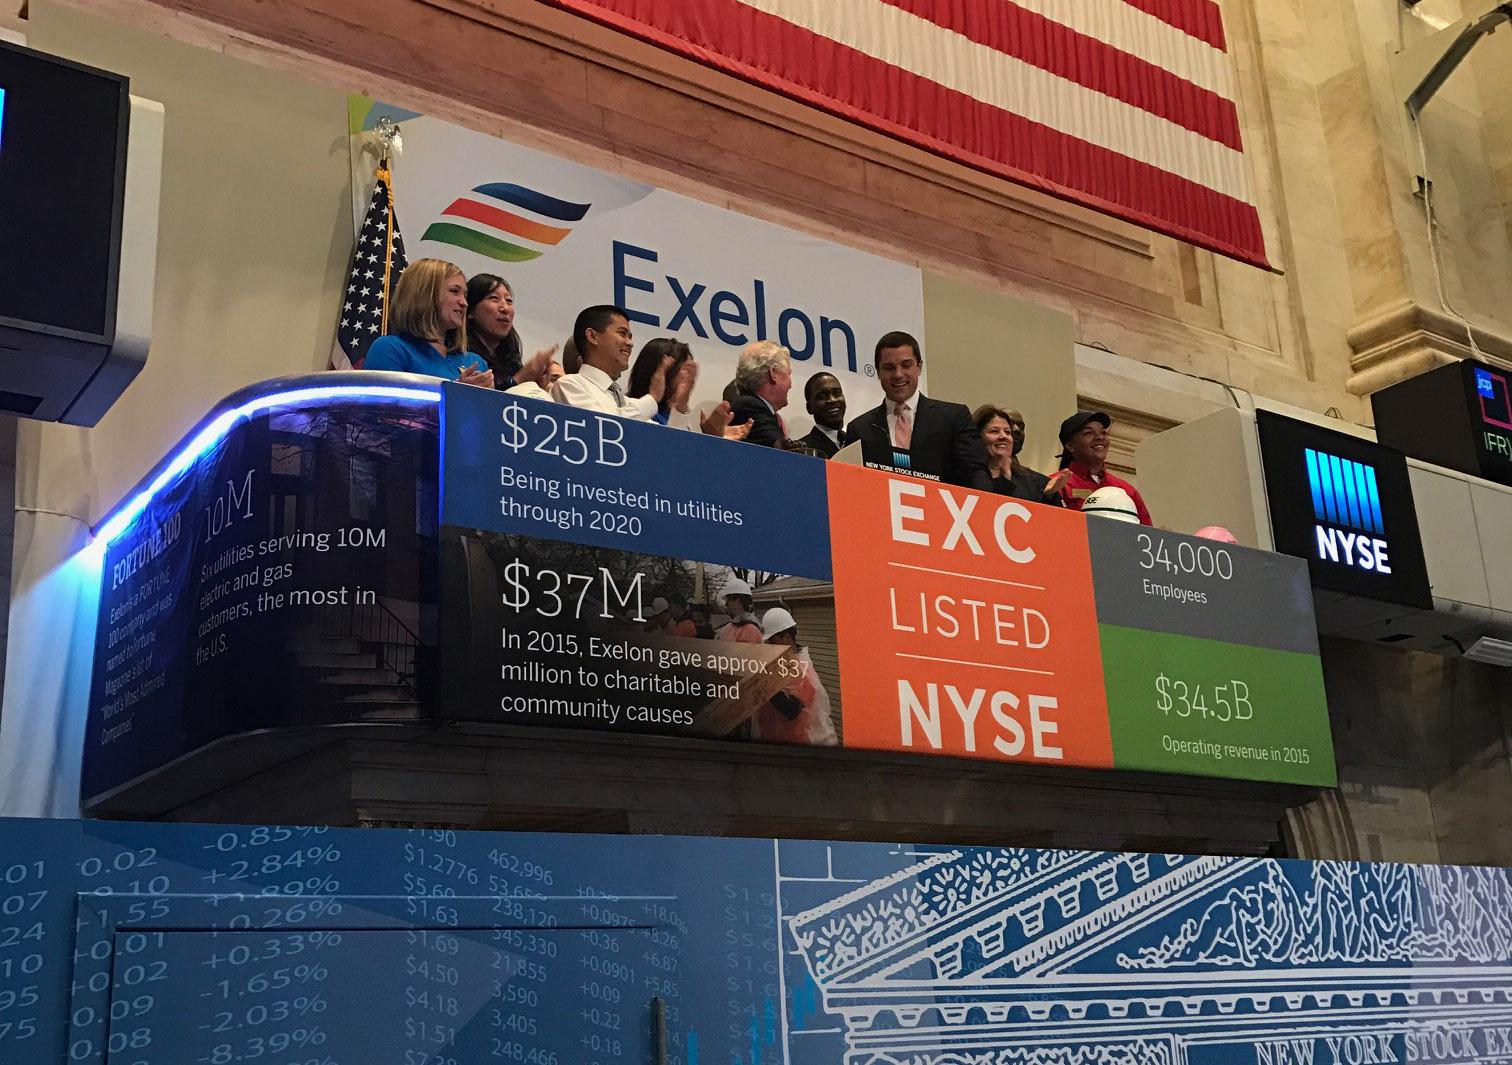 Exelon employees